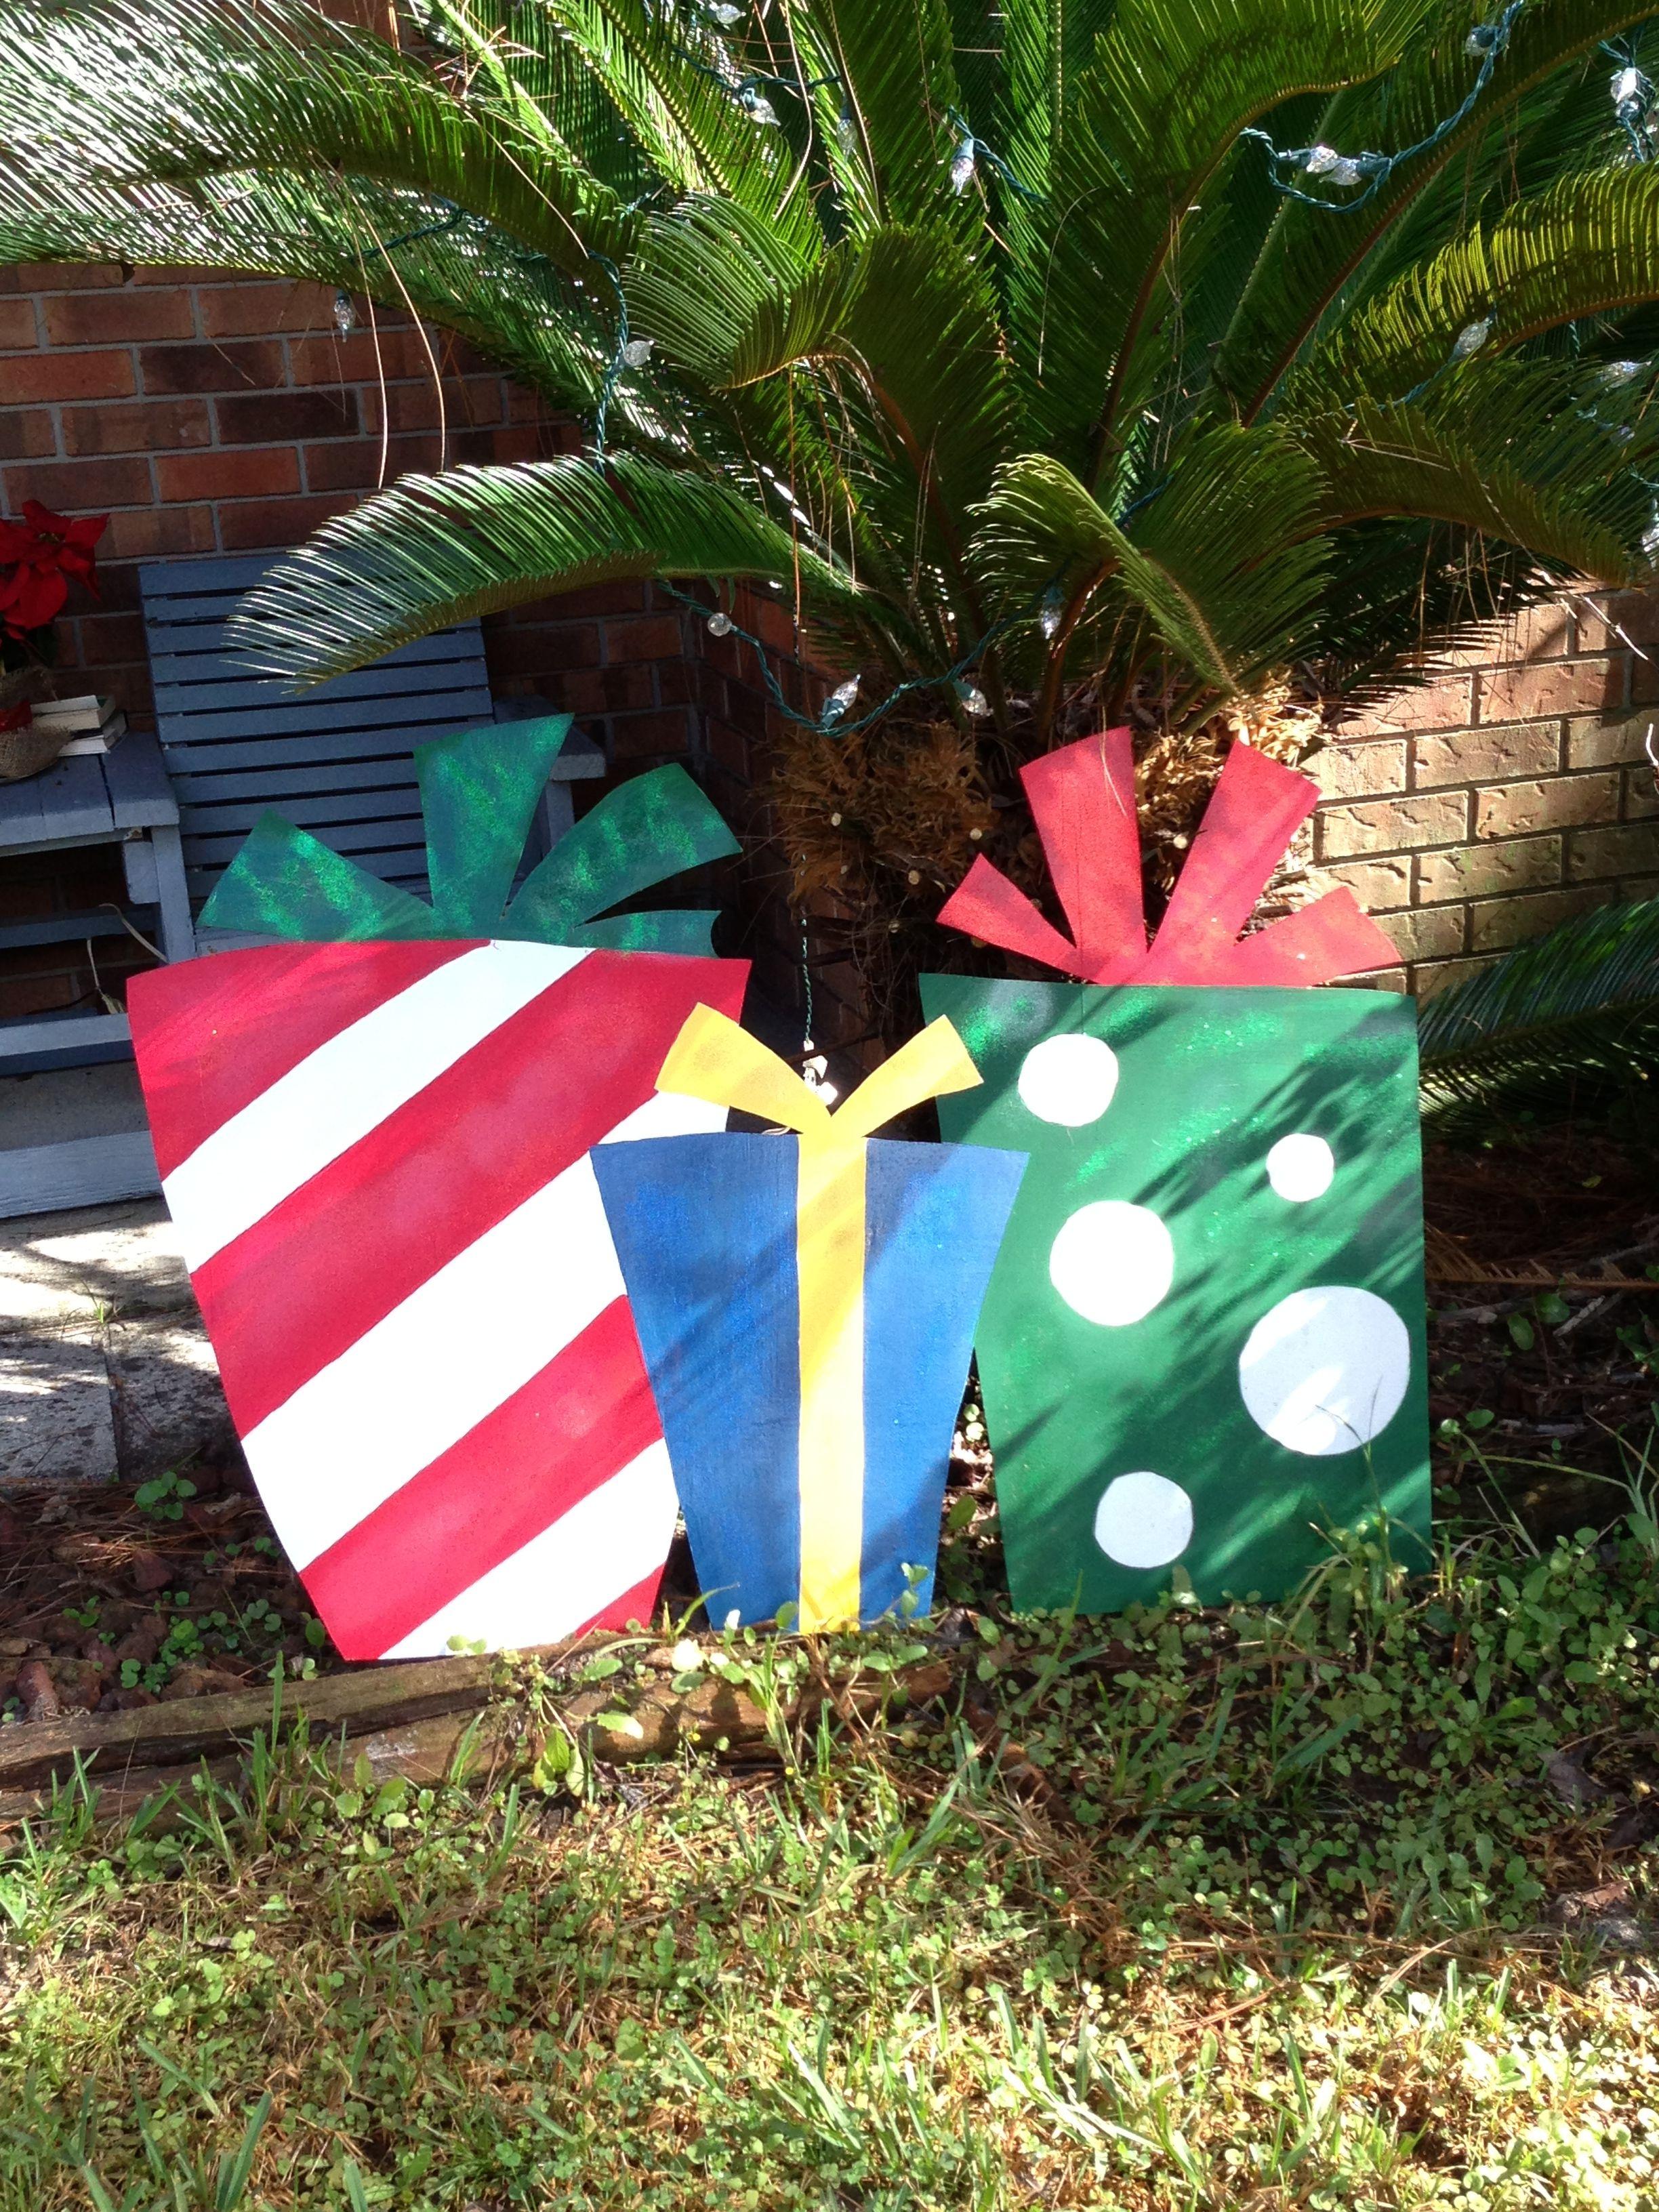 Wooden yard ornament | Yard ornaments, Christmas gifts, Crafty